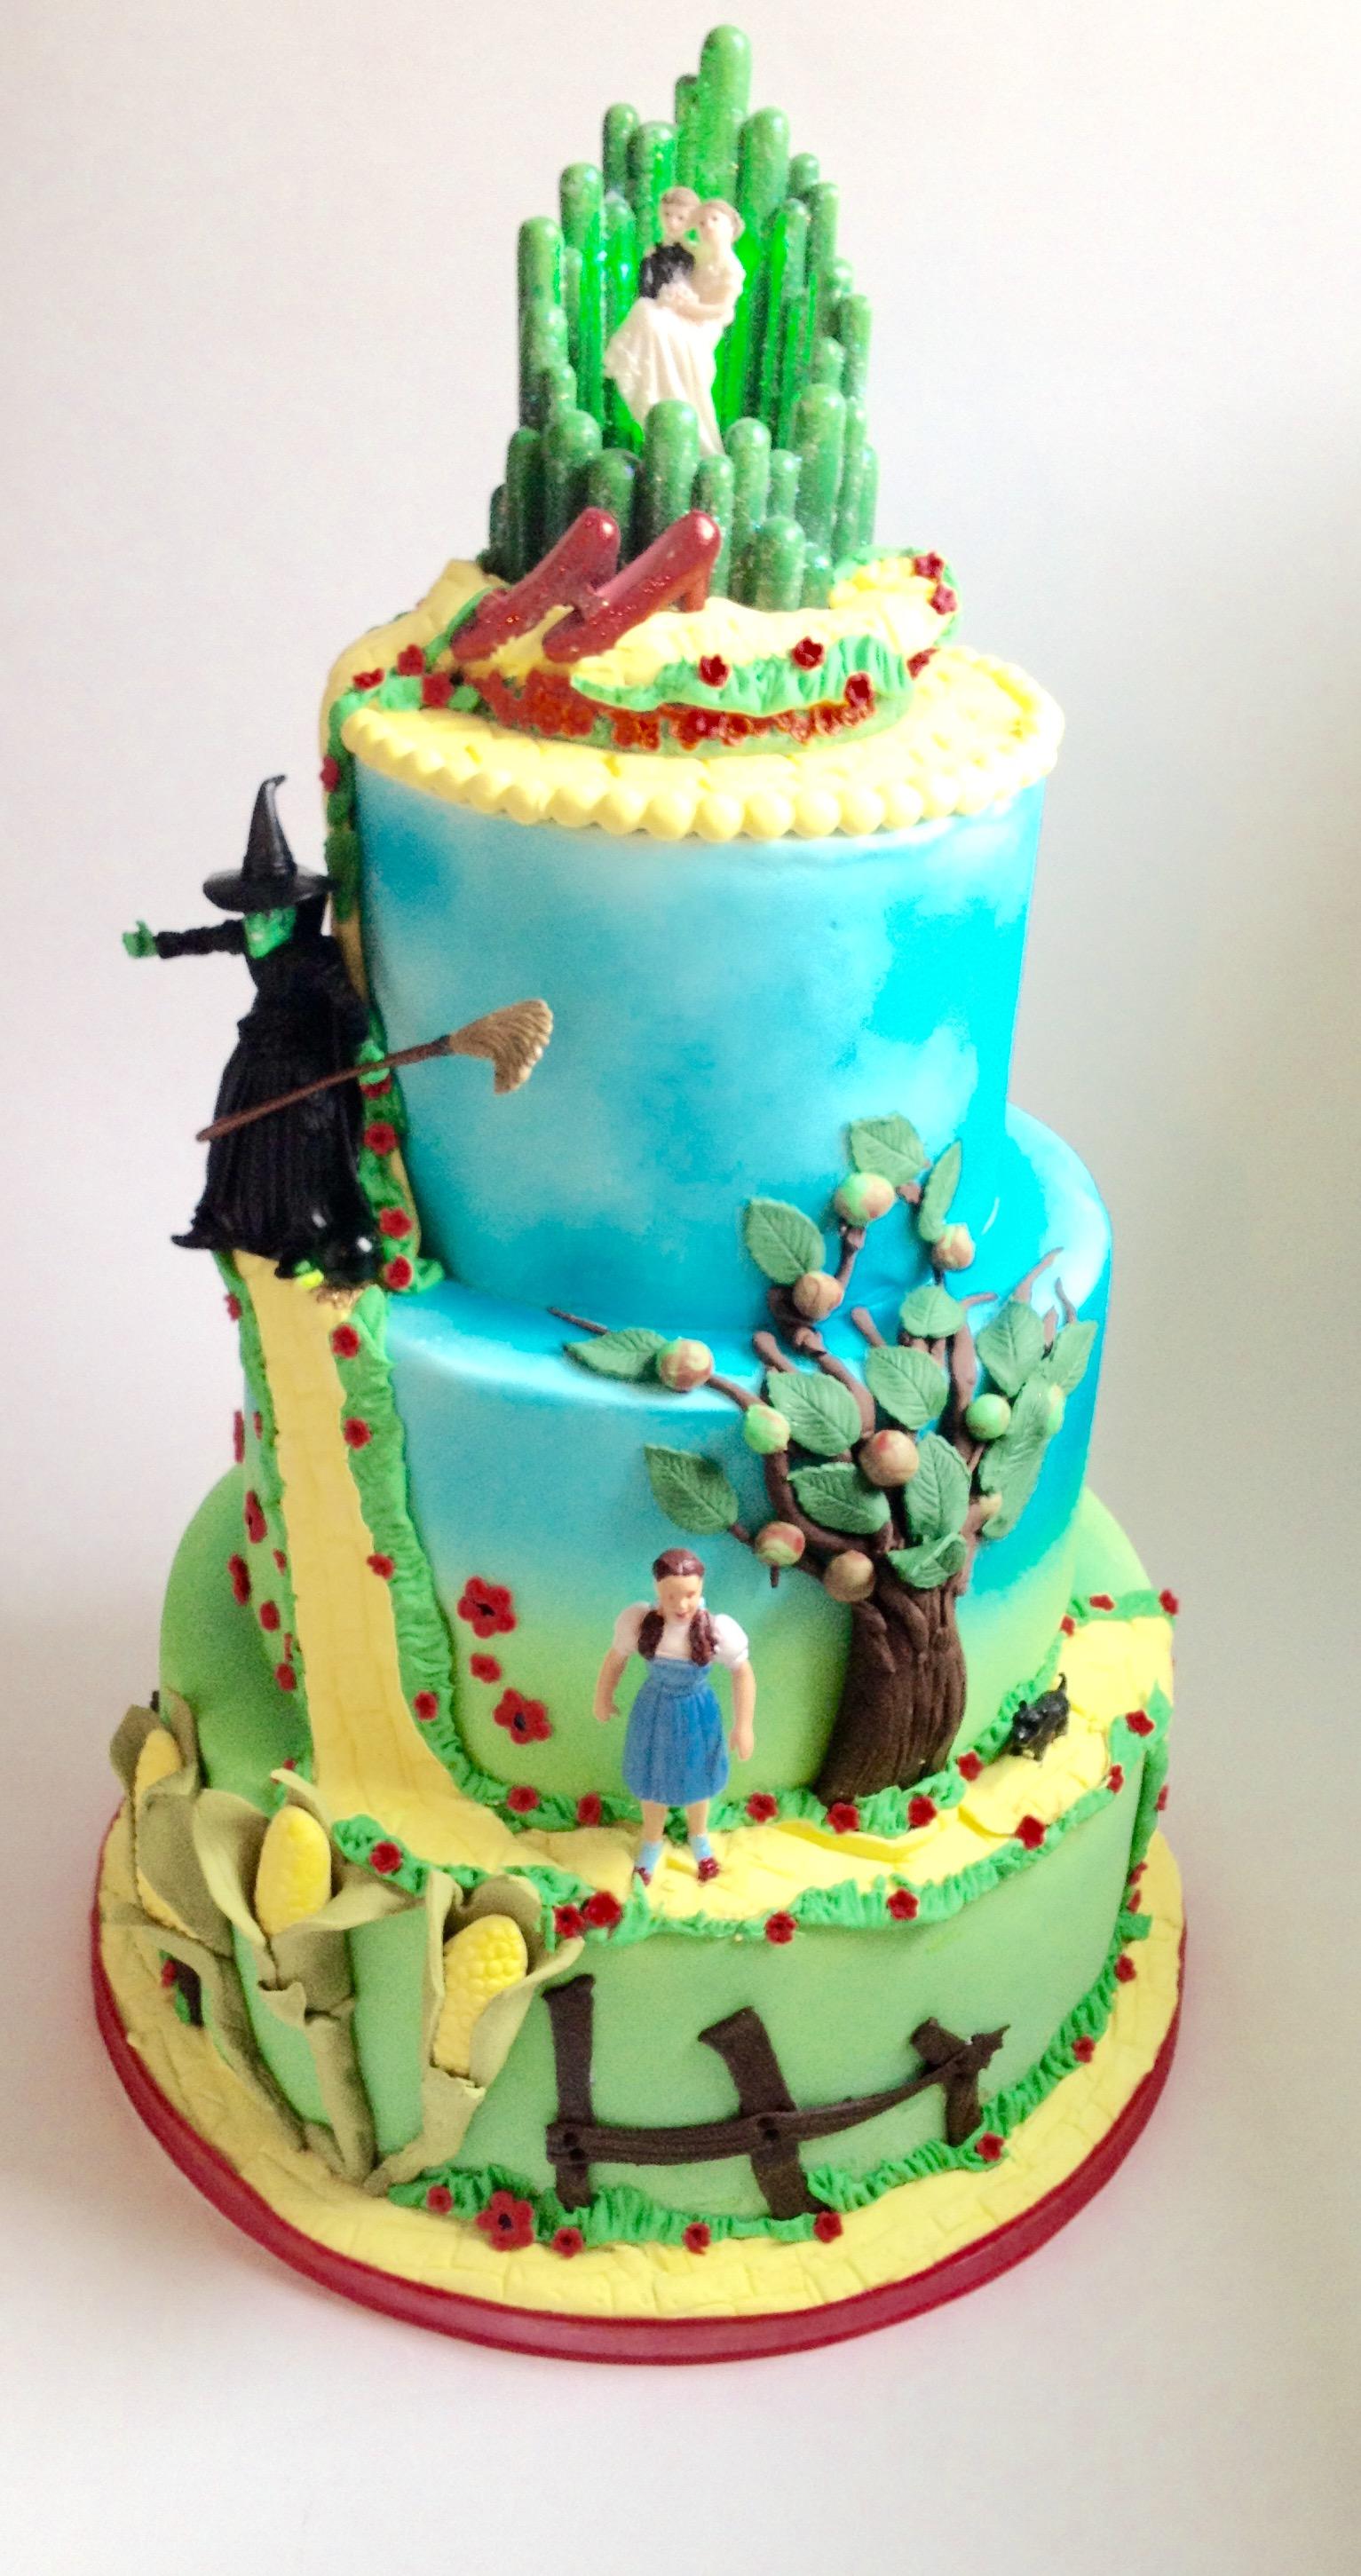 Astonishing 12 Wizzard Of Oz Themed Cakes Photo Wizard Of Oz Cake Idea Funny Birthday Cards Online Bapapcheapnameinfo